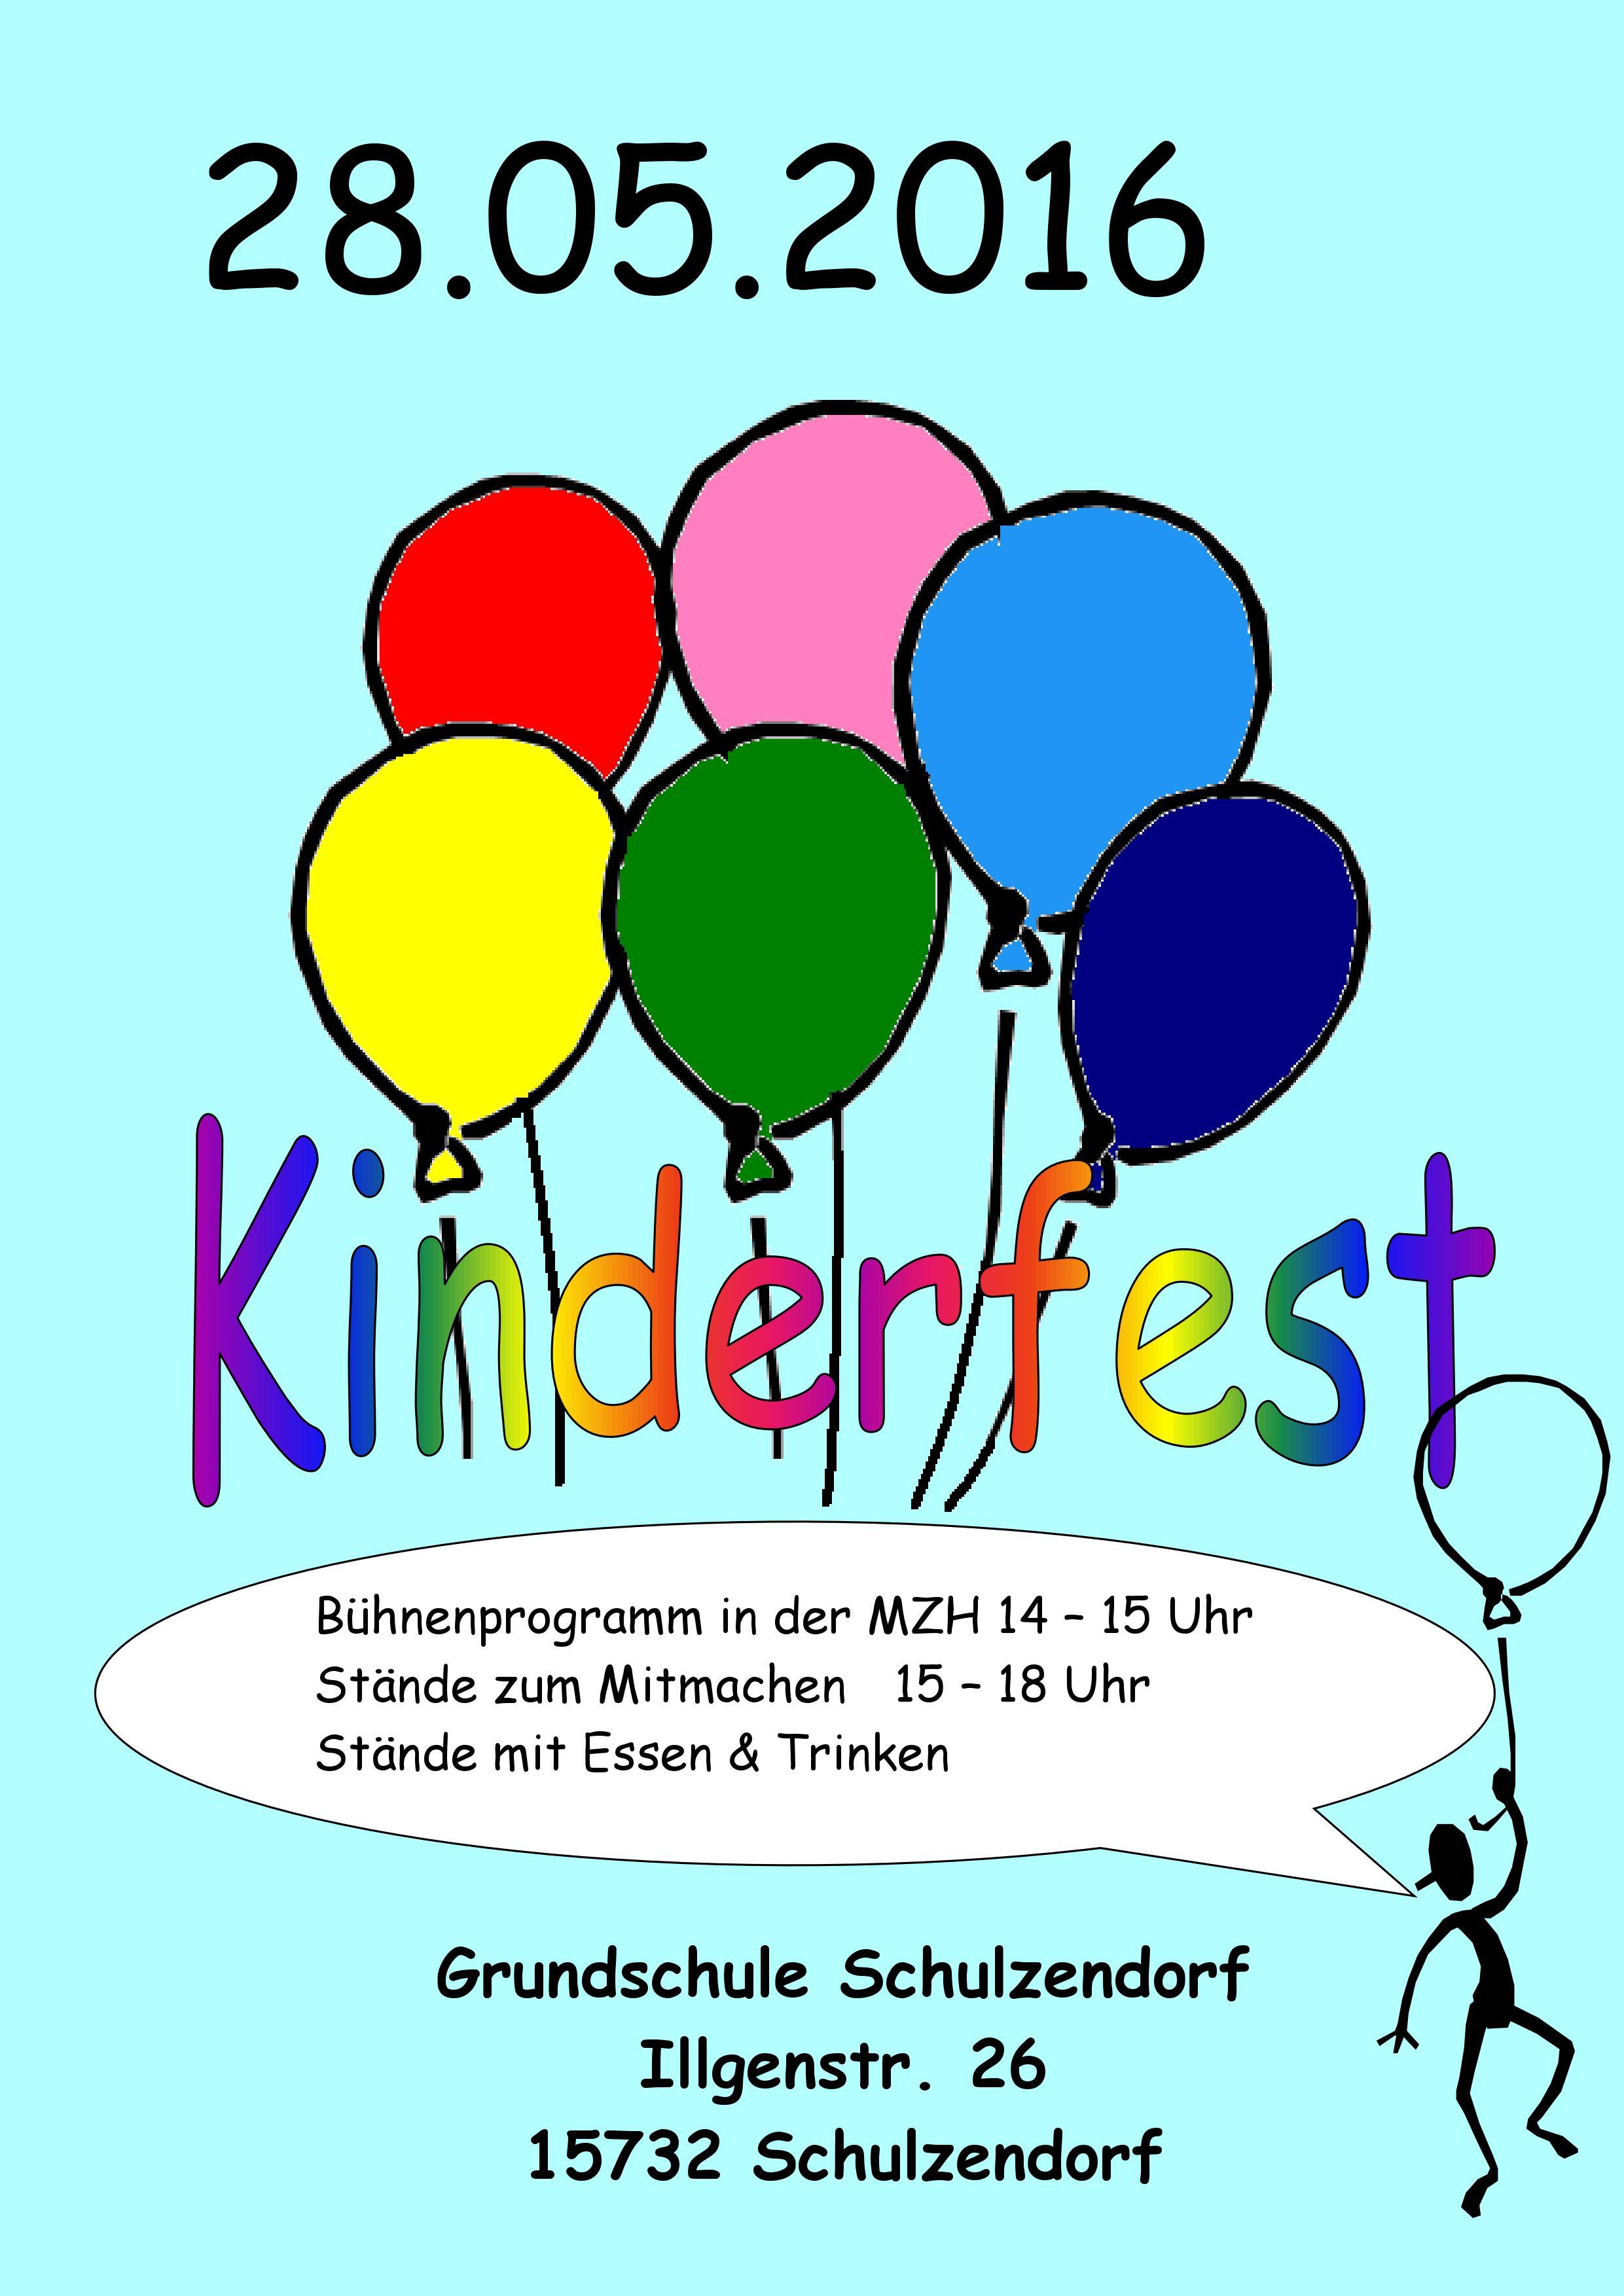 KinderfestSchulzendorf